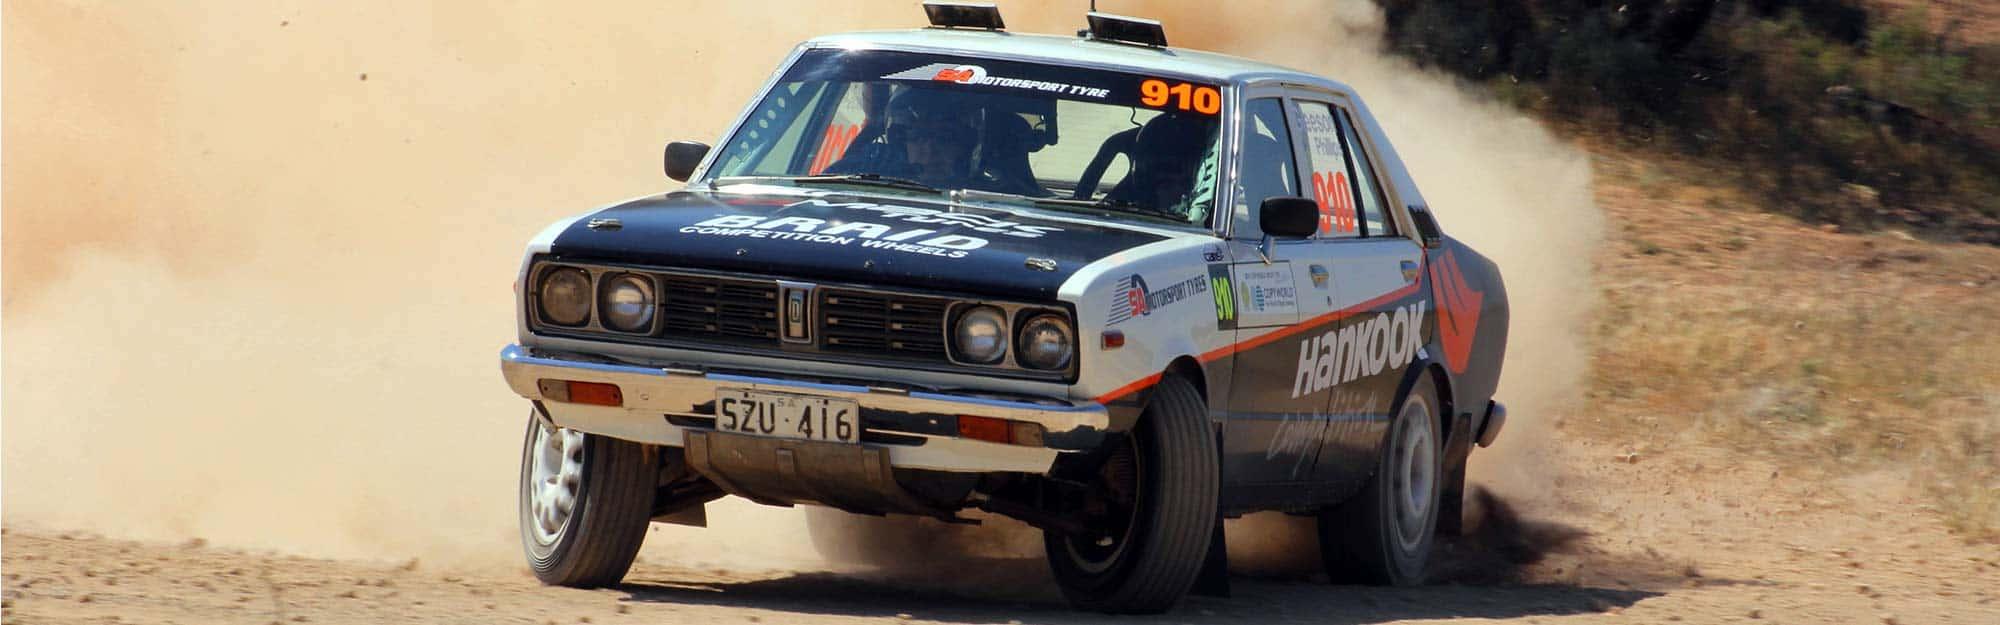 Gravel Rally Tyres